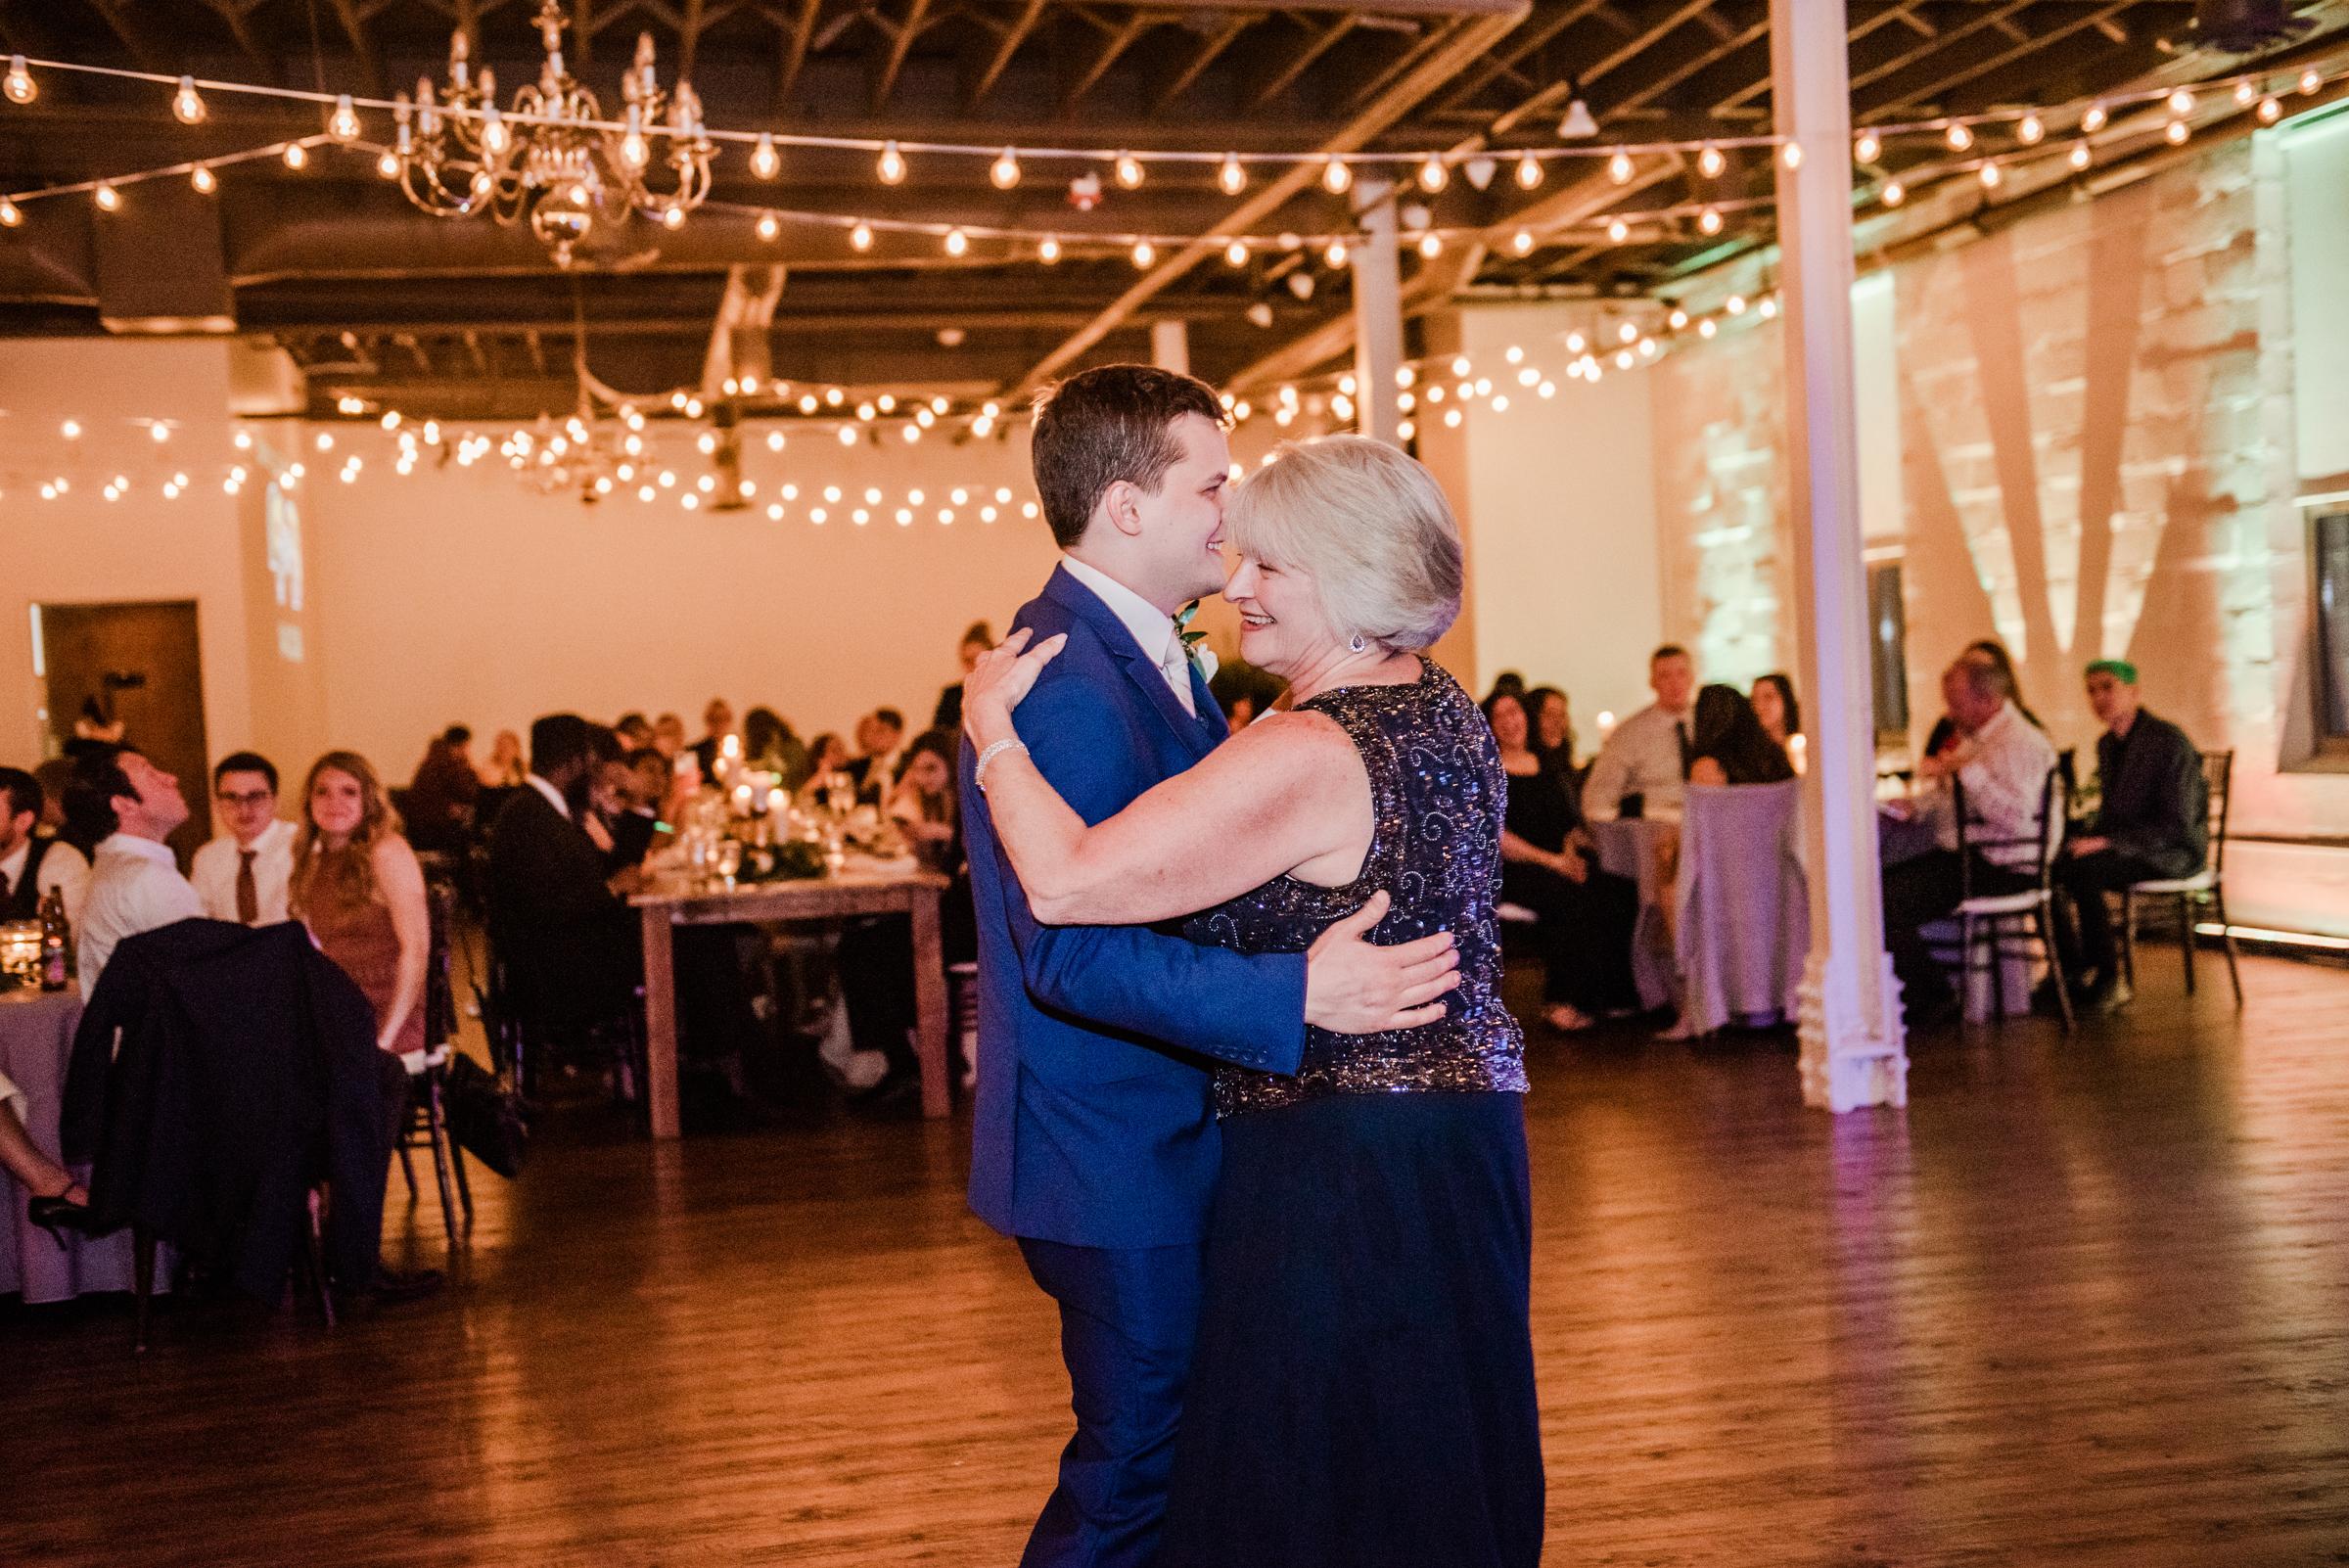 The_Arbor_LoftRochester_Wedding_JILL_STUDIO_Rochester_NY_Photographer_201839.jpg